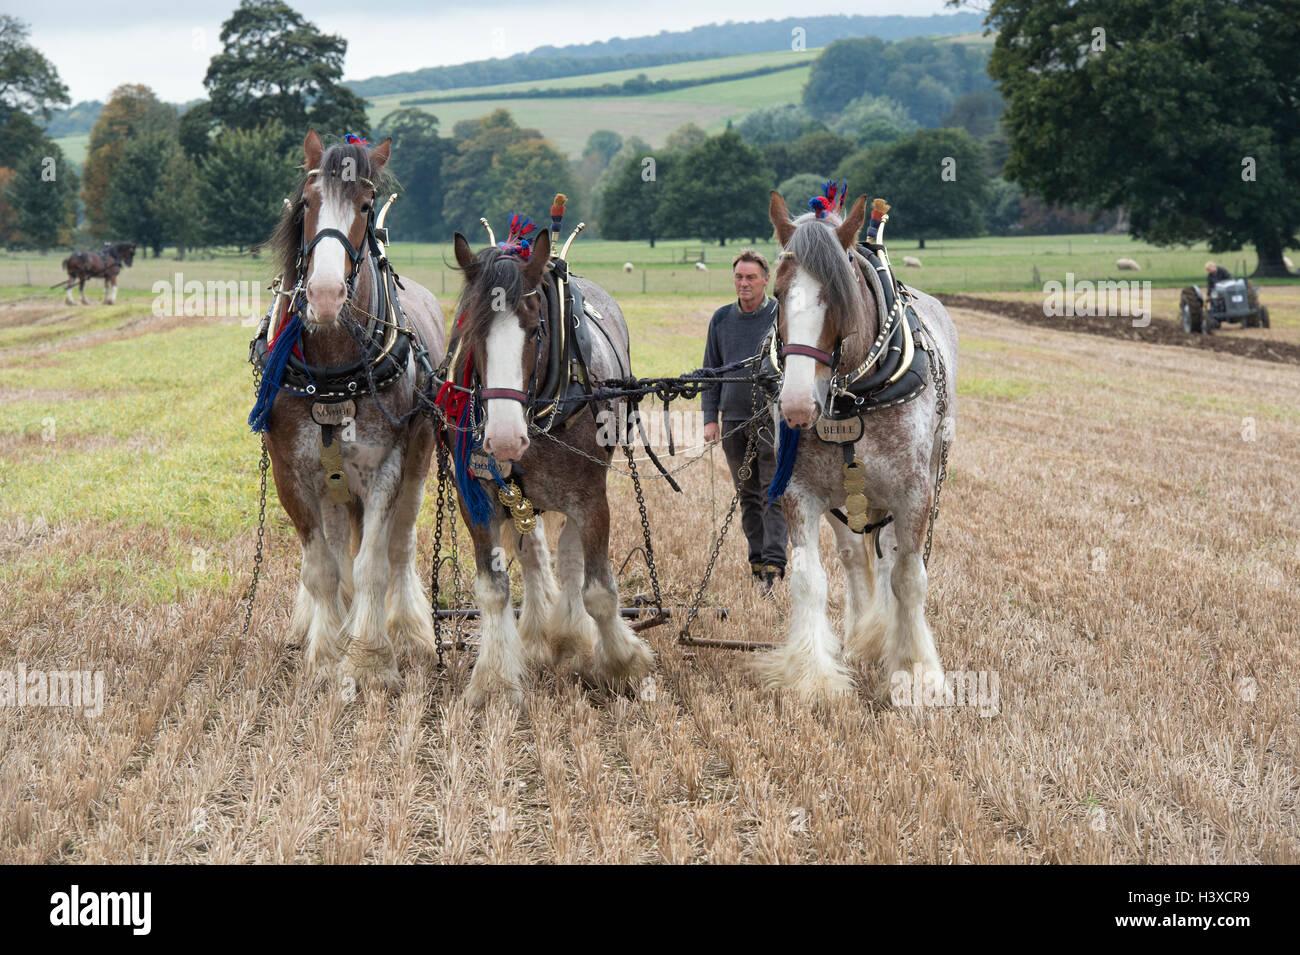 Traditional Harrowing Stock Photos & Traditional Harrowing ...   People Pulling Harrows